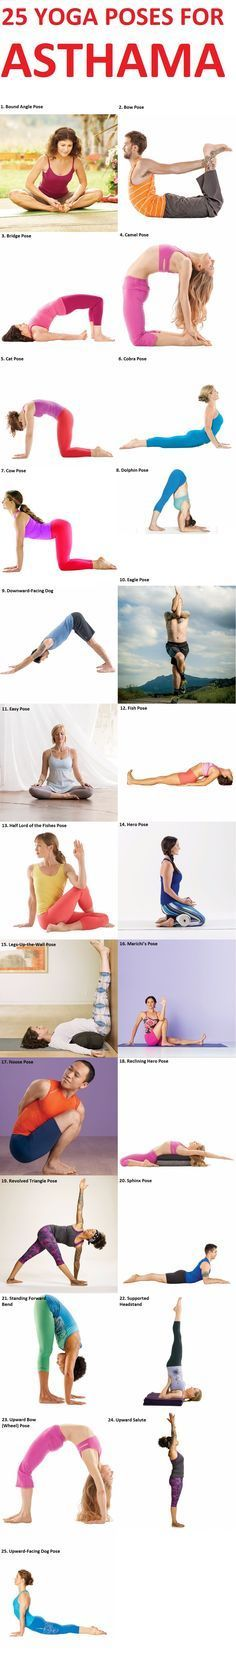 25 Yoga Poses To Treat Asthma - The Xerxes - Yoga Poses to Treat Asthama - . - 25 Yoga Poses To Treat Asthma – The Xerxes – Yoga Poses to Treat Asthama – … – 25 Yoga Poses To Treat Asthma – The Xerxes – Yoga Poses to Treat Asthama – - Asthma Relief, Asthma Remedies, Yoga Posen, Medical Prescription, Yoga Sequences, Best Yoga, Health And Safety, Morning Yoga, Yoga Poses